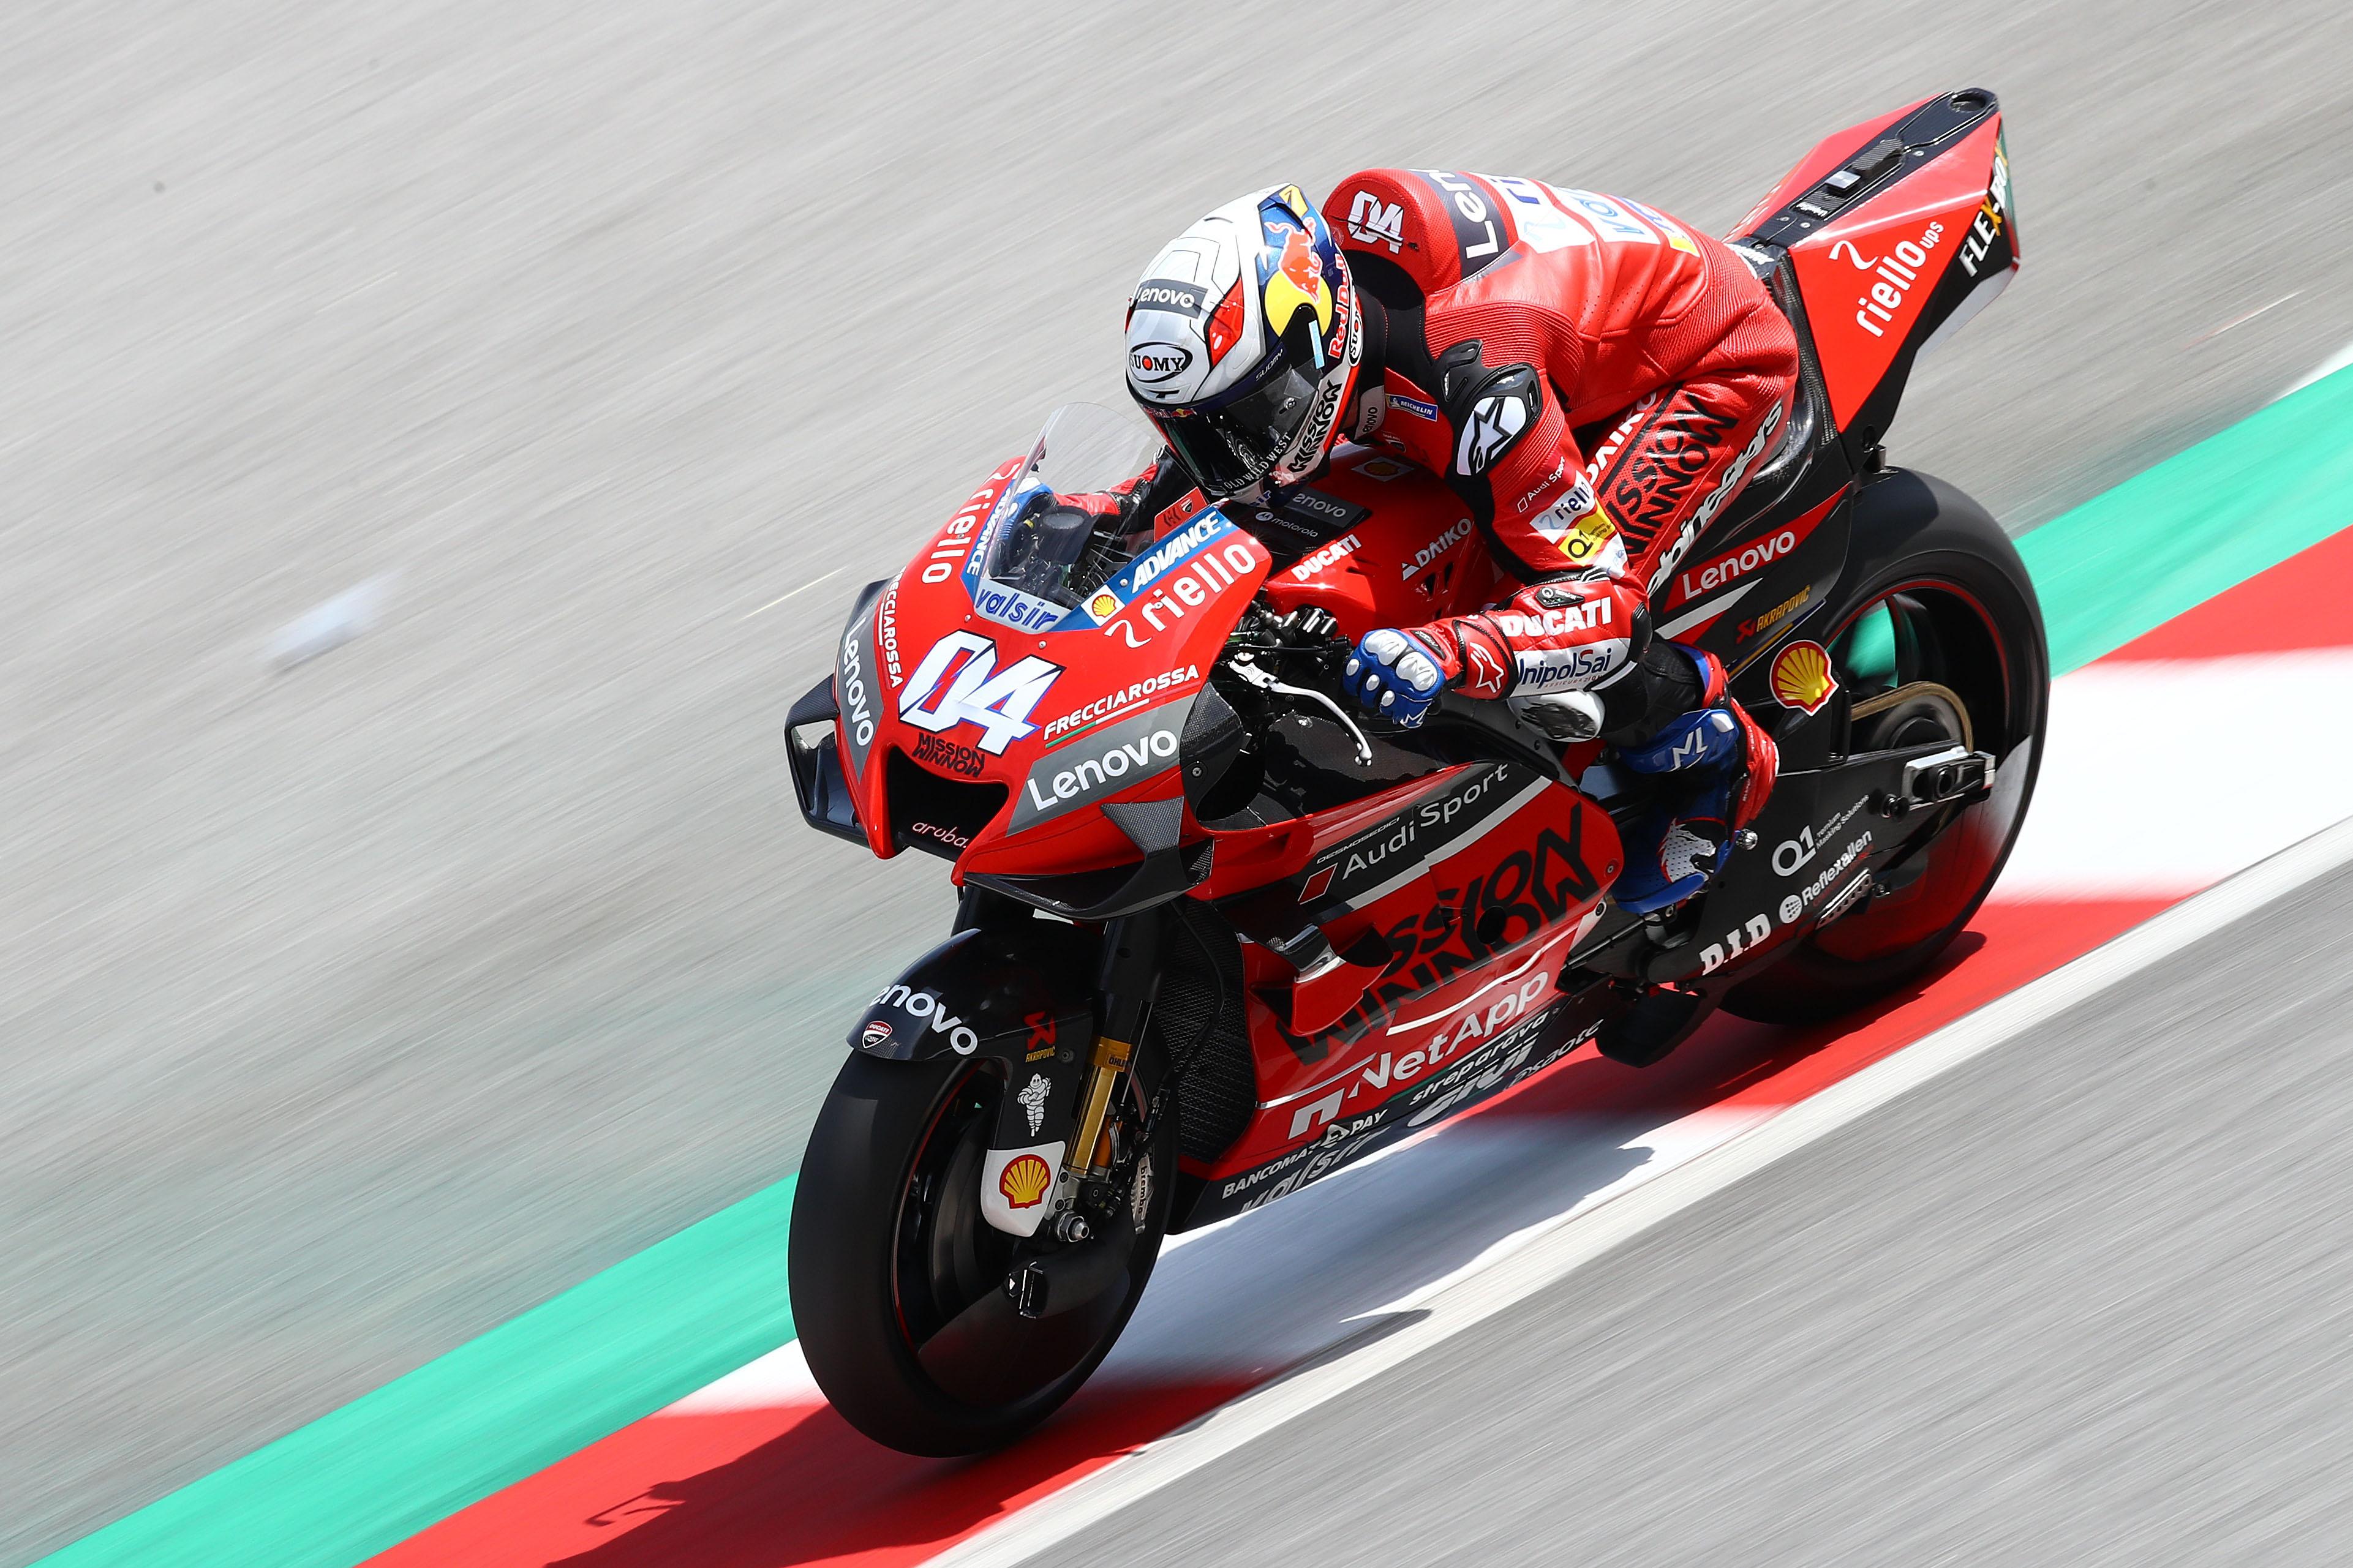 Andrea Dovizioso Ducati MotoGP testing 2020